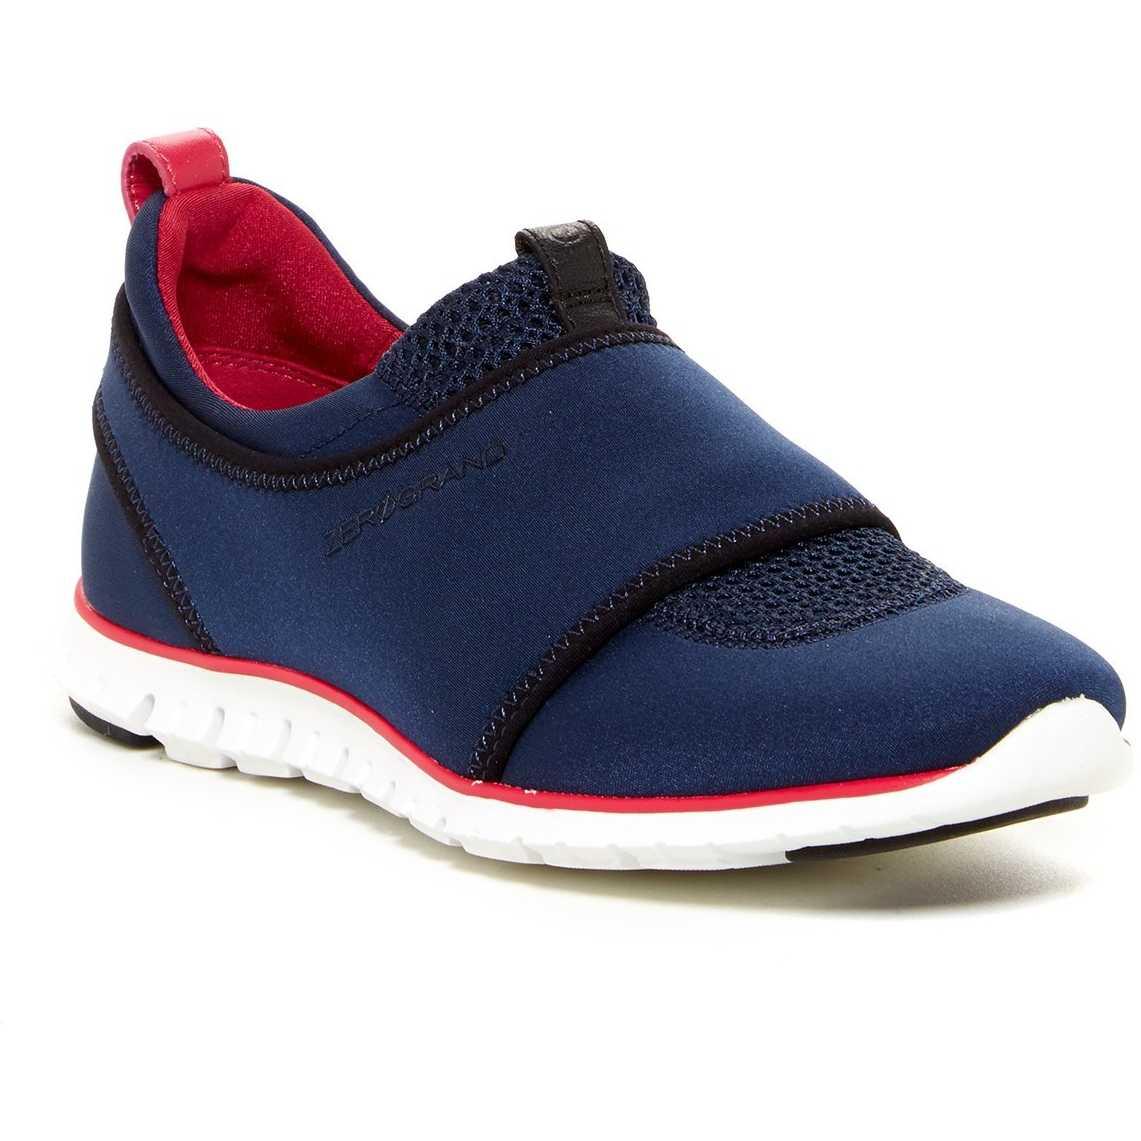 Cole Haan ZeroGrand Slip-On Sneaker BLZR BLU-BLCK-ELCTR pentru dama